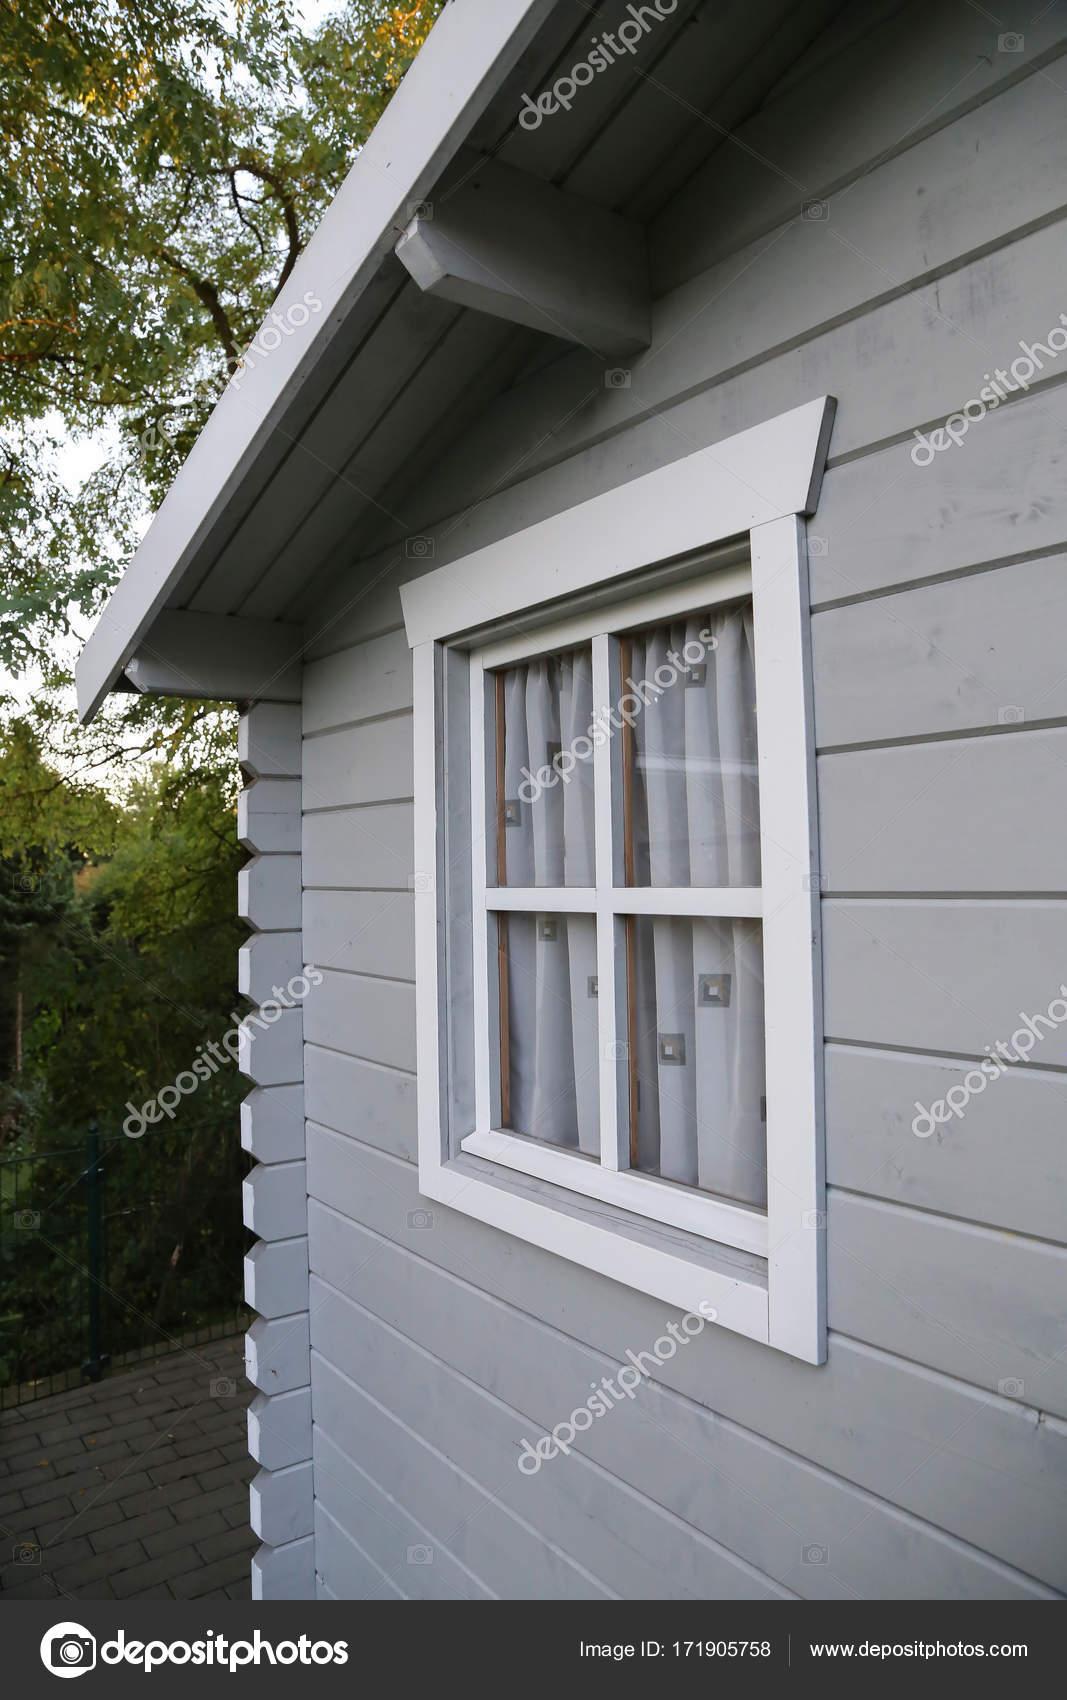 598e5b4c32c3 Σπίτι Κήπος Θραύσμα Ενός Στον Κήπο Σπιτιού Λεπτομέρειες — Φωτογραφία Αρχείου